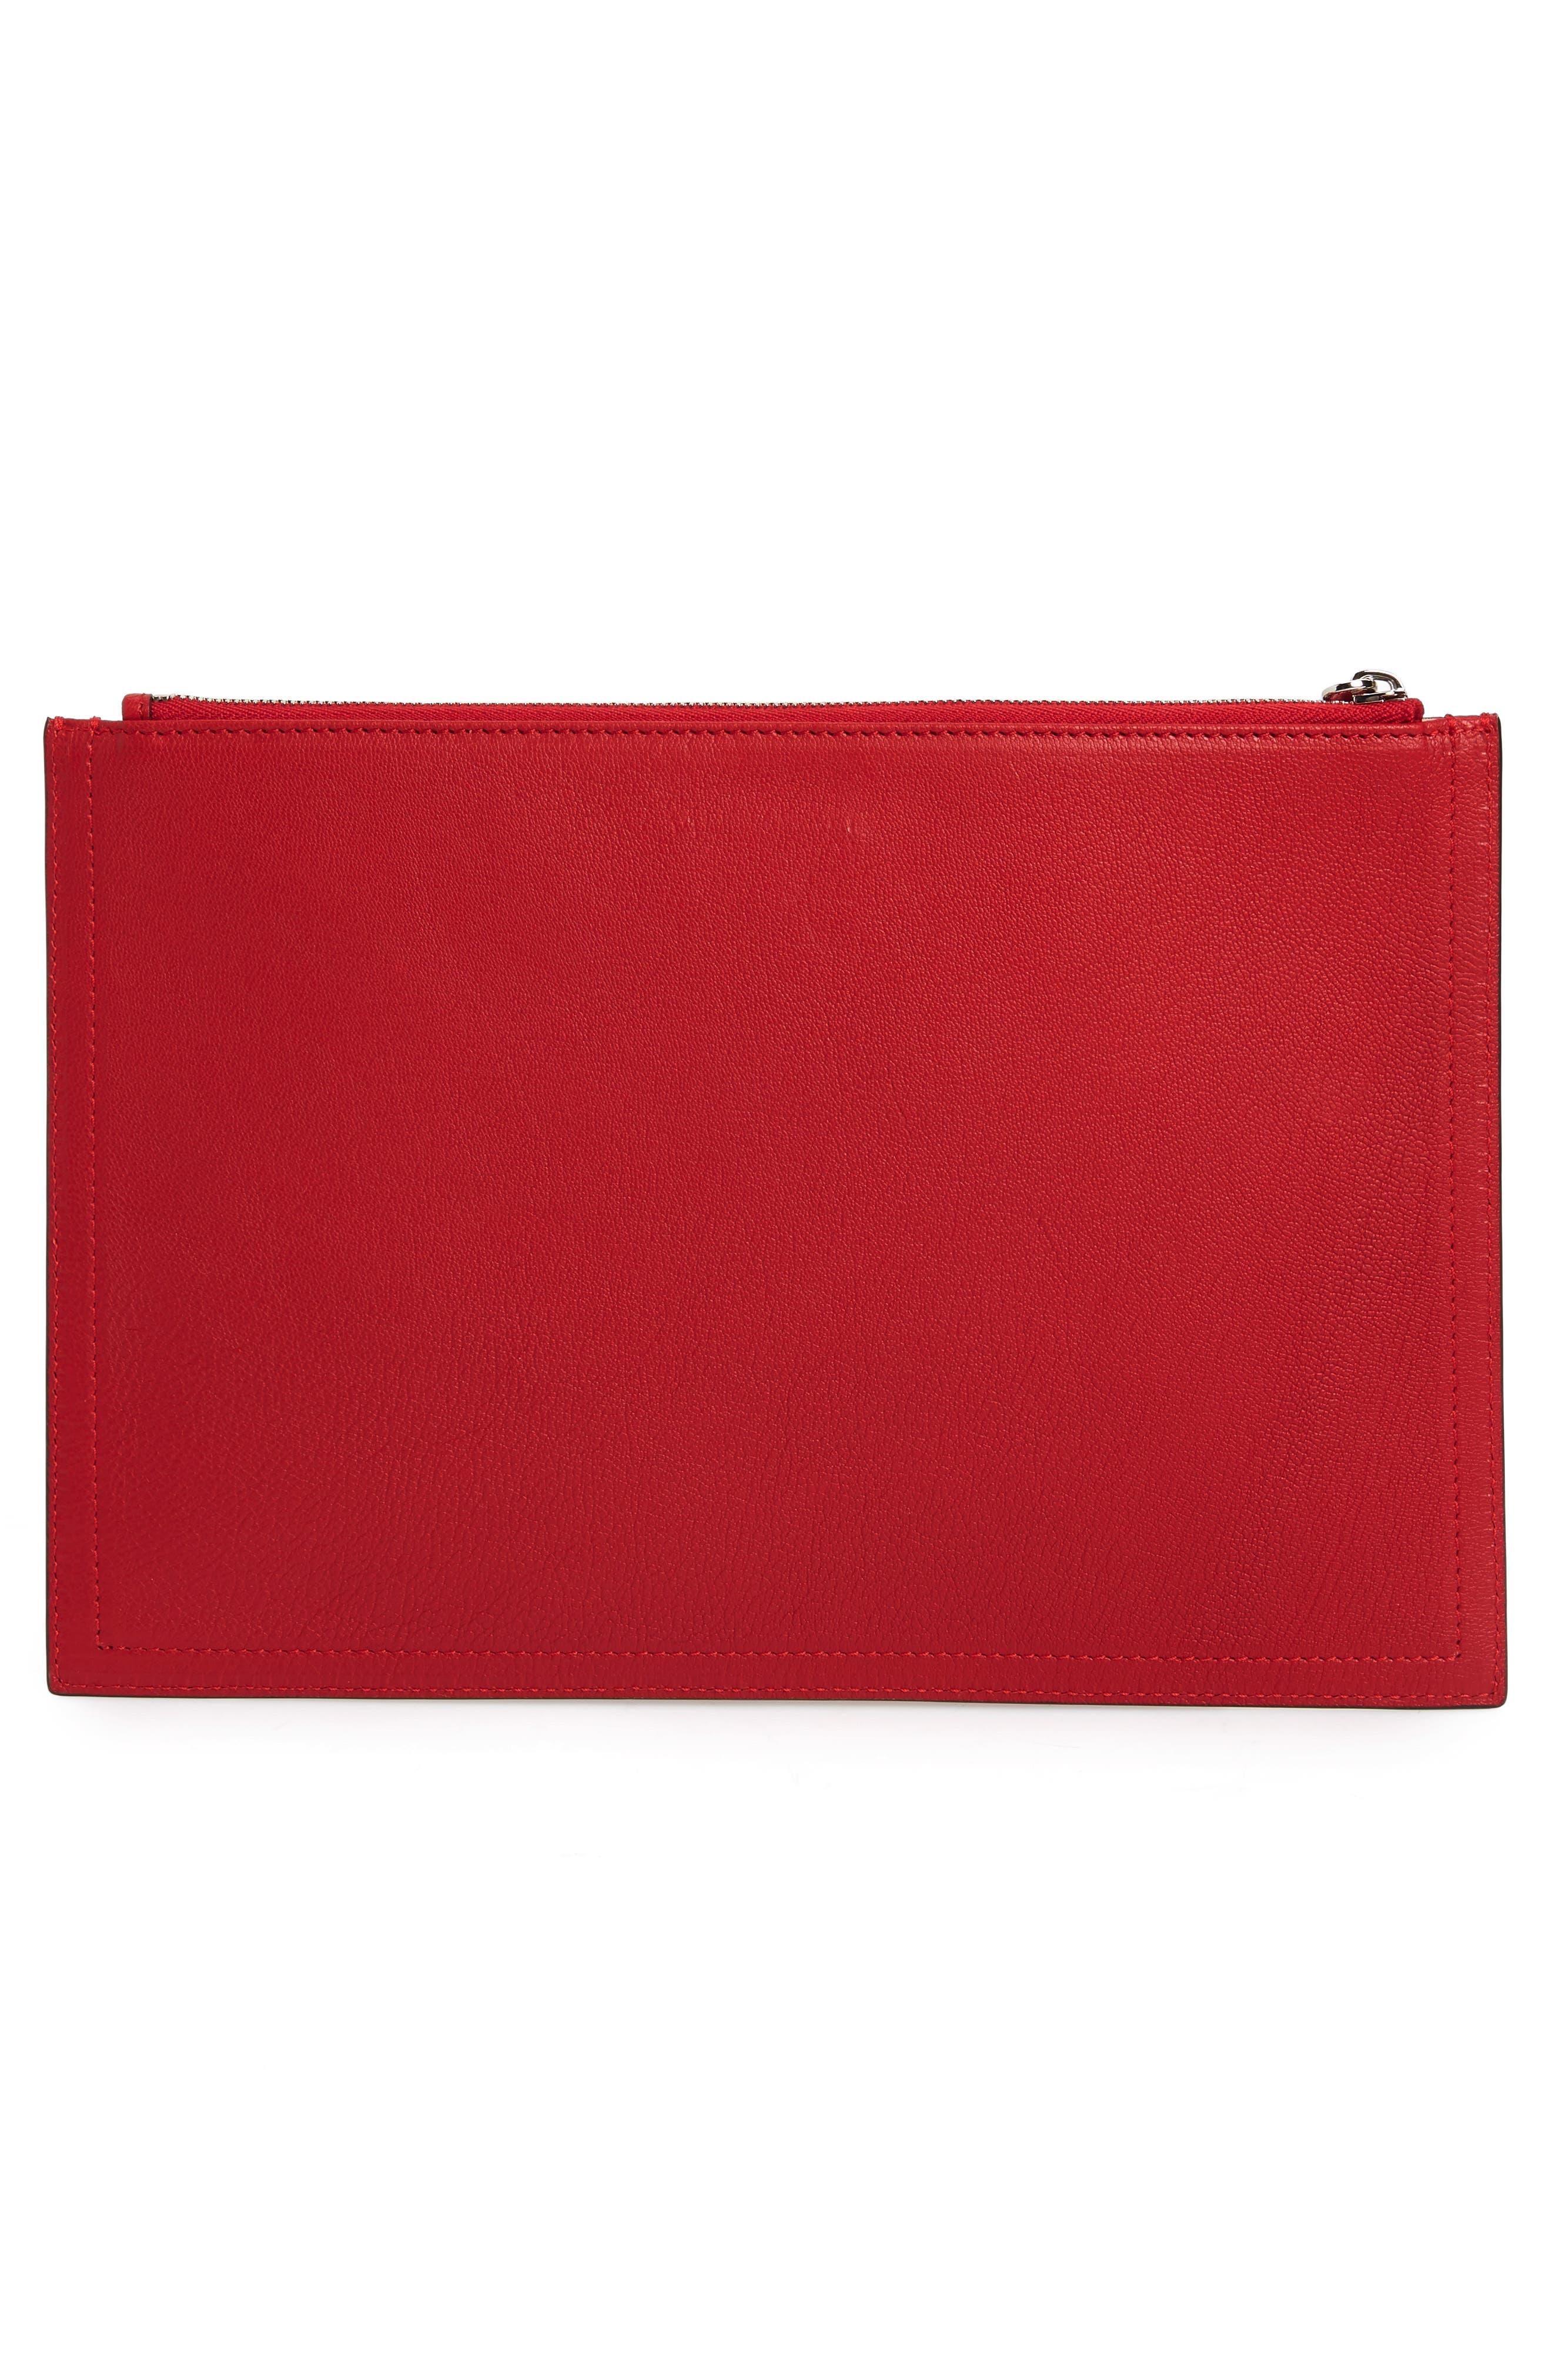 Medium Antigona Leather Pouch,                             Alternate thumbnail 3, color,                             Bright Red